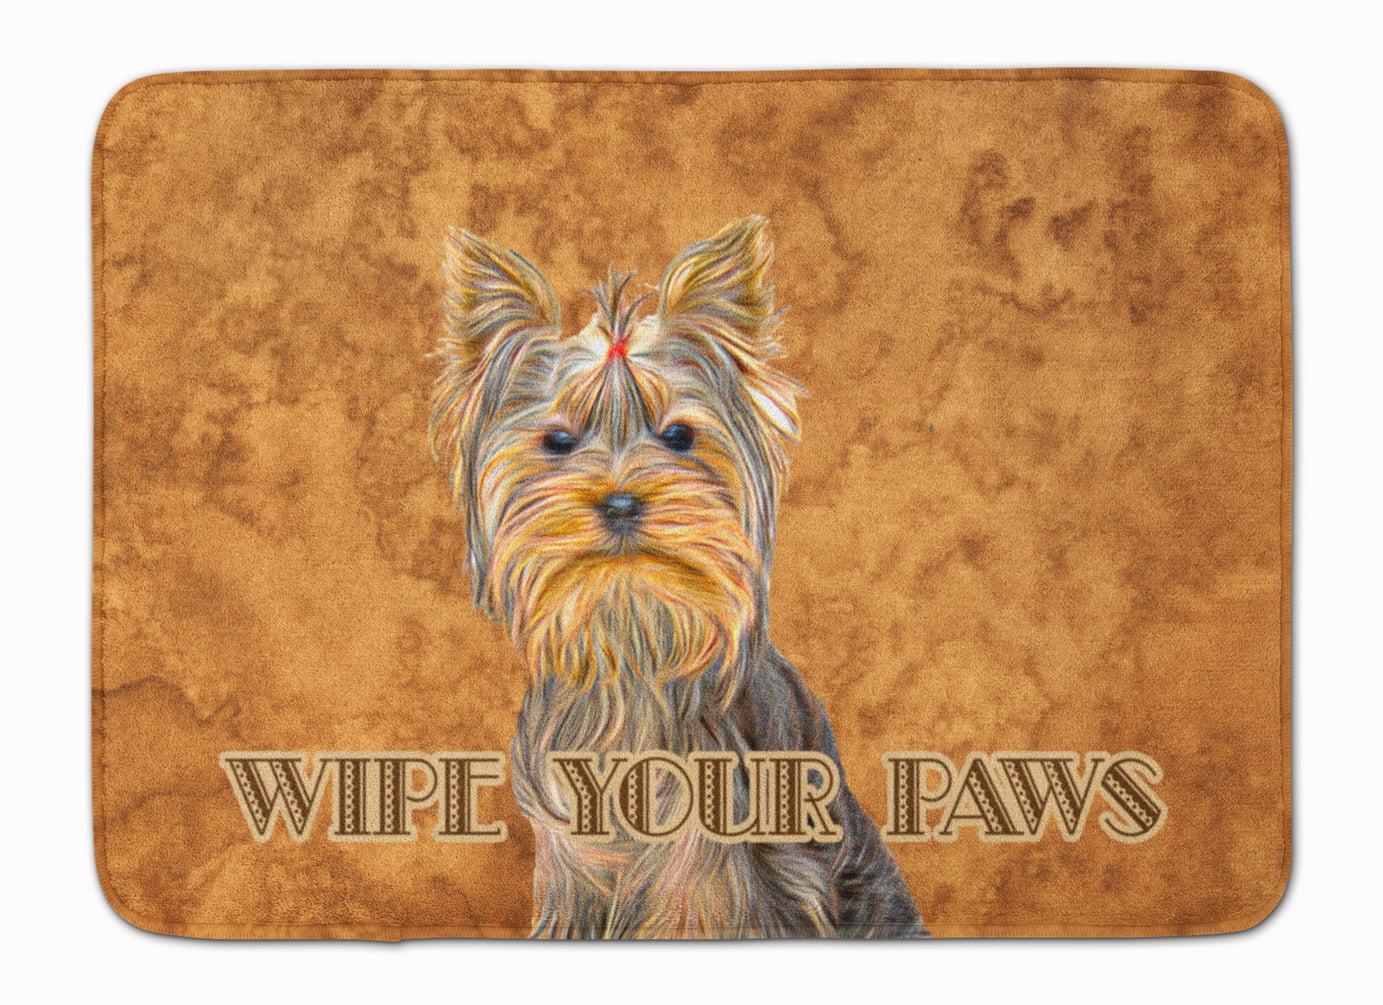 Yorkie Yorkshire Terrier Wipe Your Paws Machine Washable Memory Foam Mat Walmart Com Walmart Com